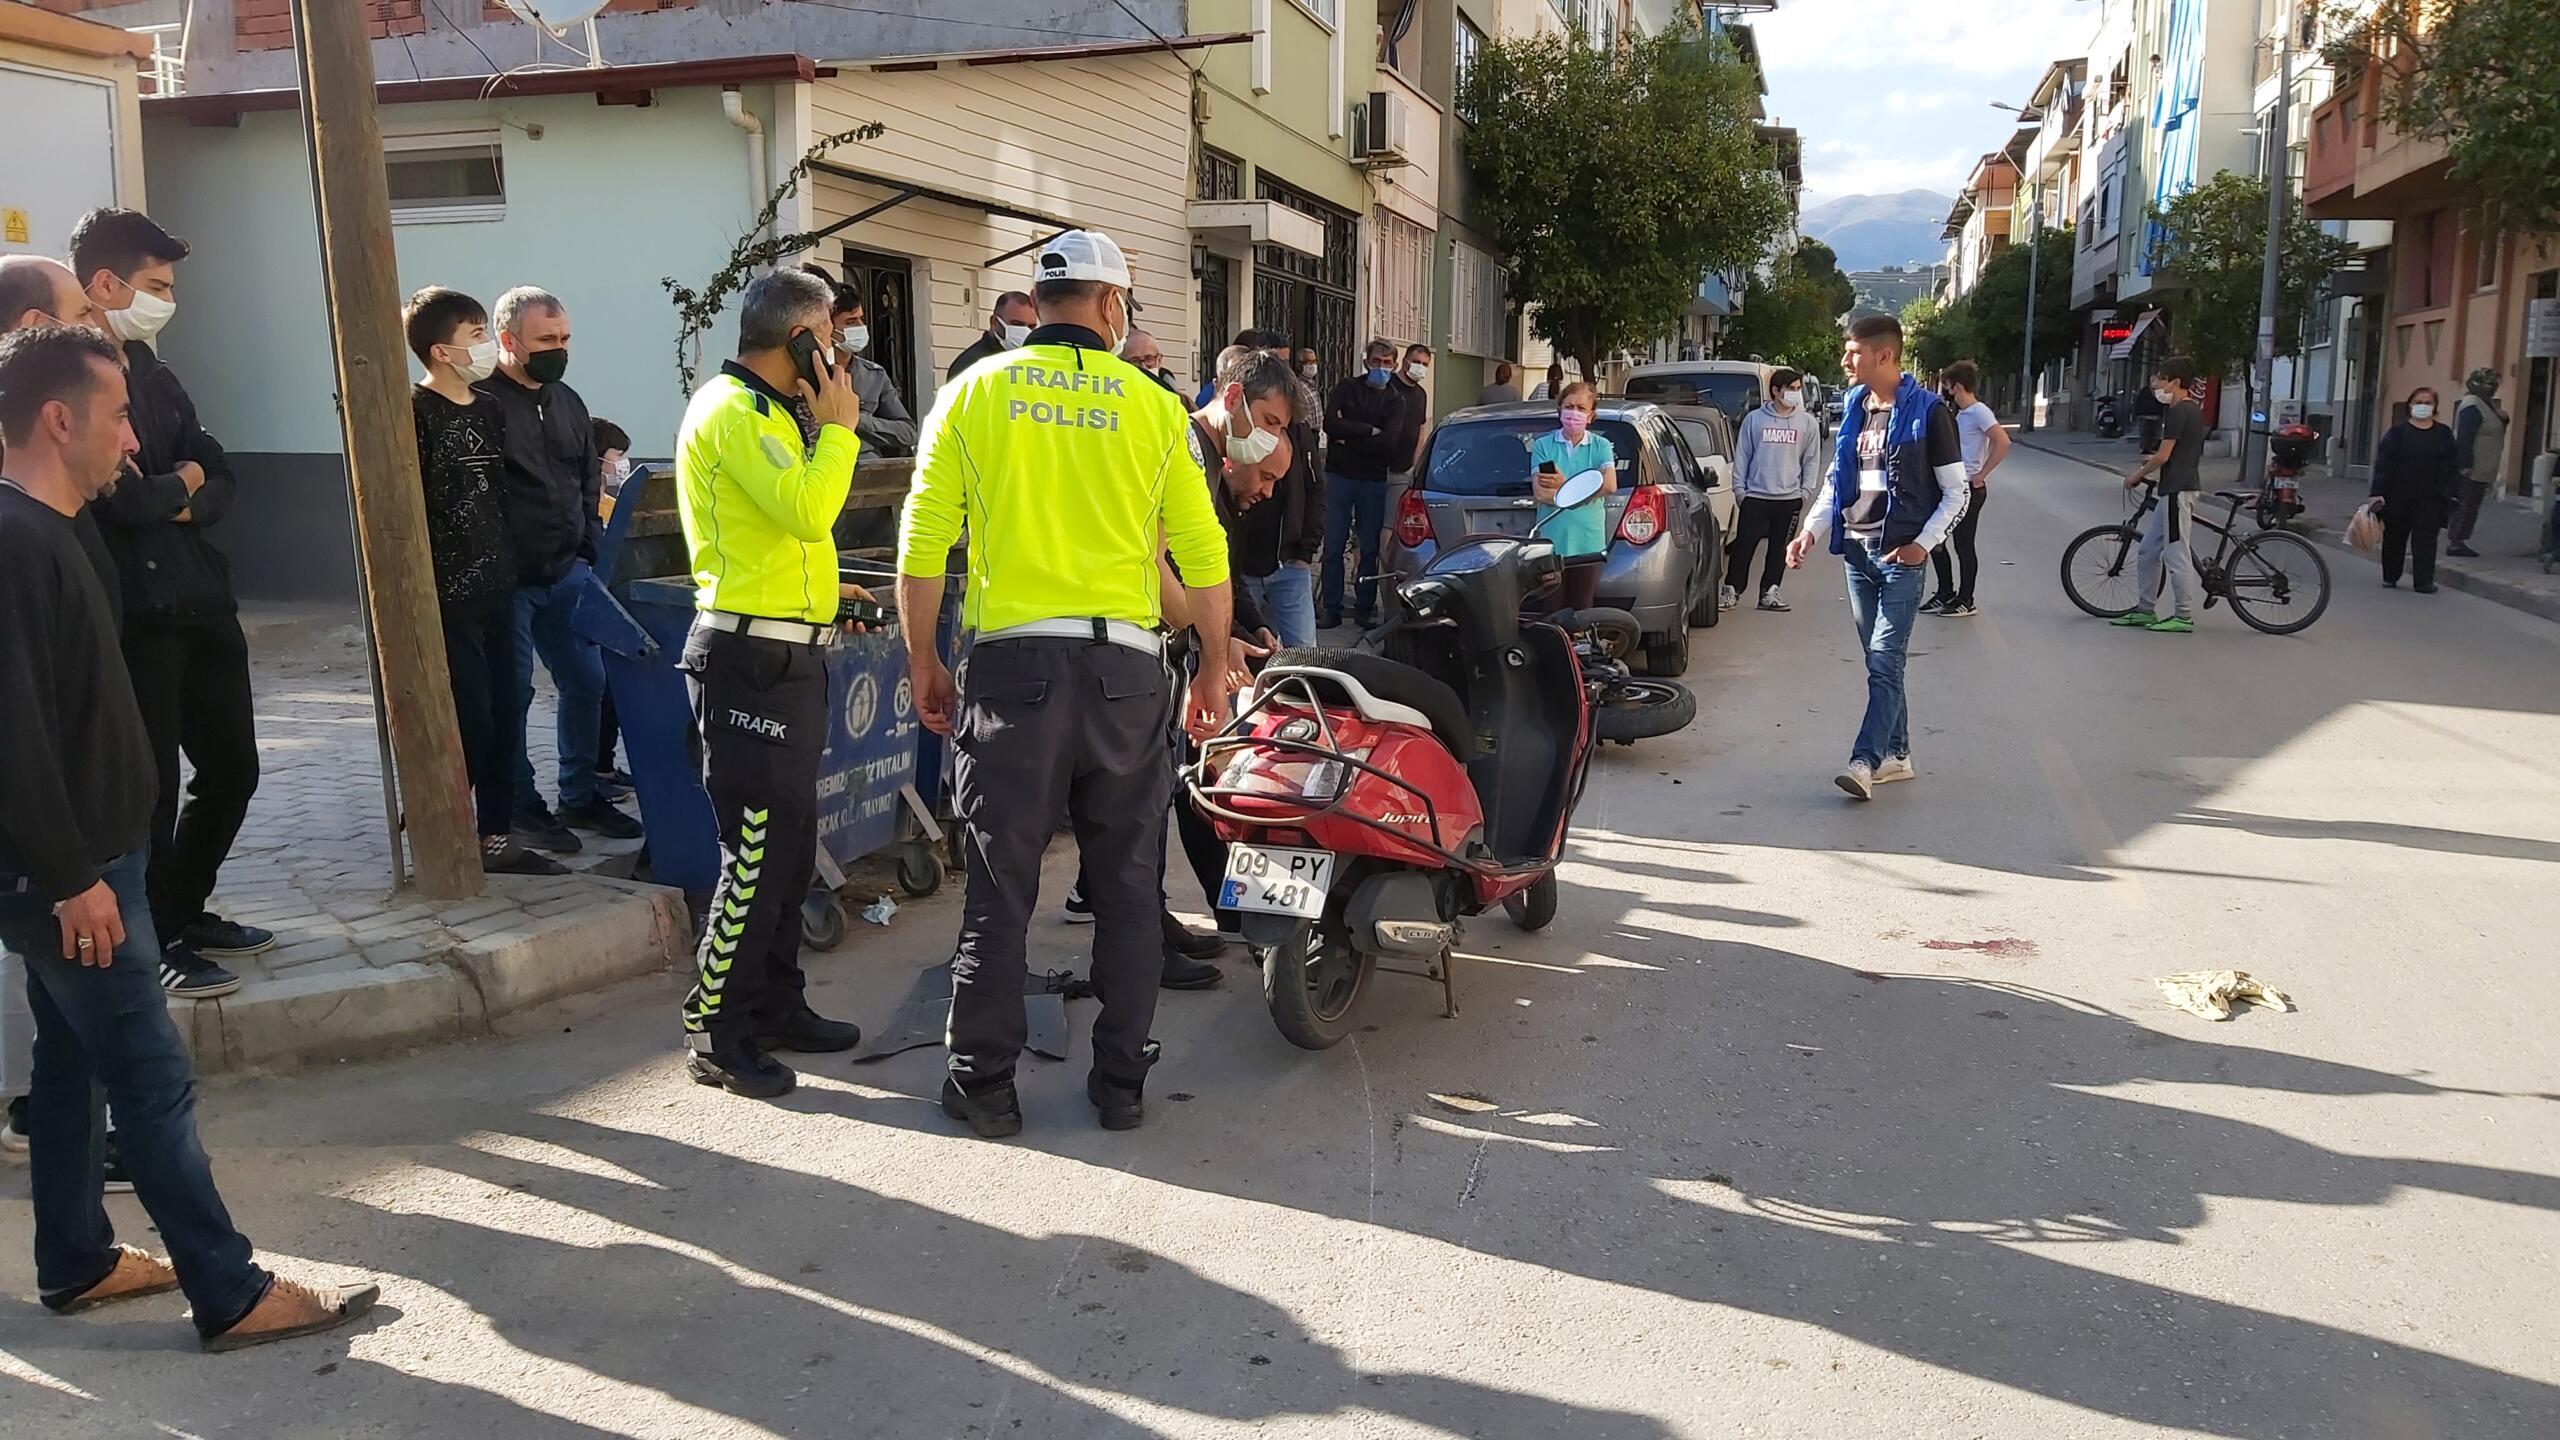 Nazilli'de Feci Kaza; 1'i Ağır 3 Kişi Yaralandı